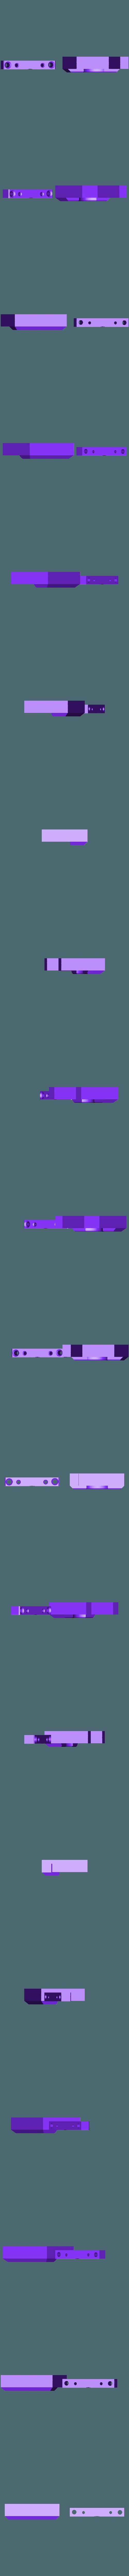 Z_Motor_Bracket_Combined.stl Download free STL file Creality CR-10 Z Motor Bracket • 3D printing design, Double_Alfa_3D